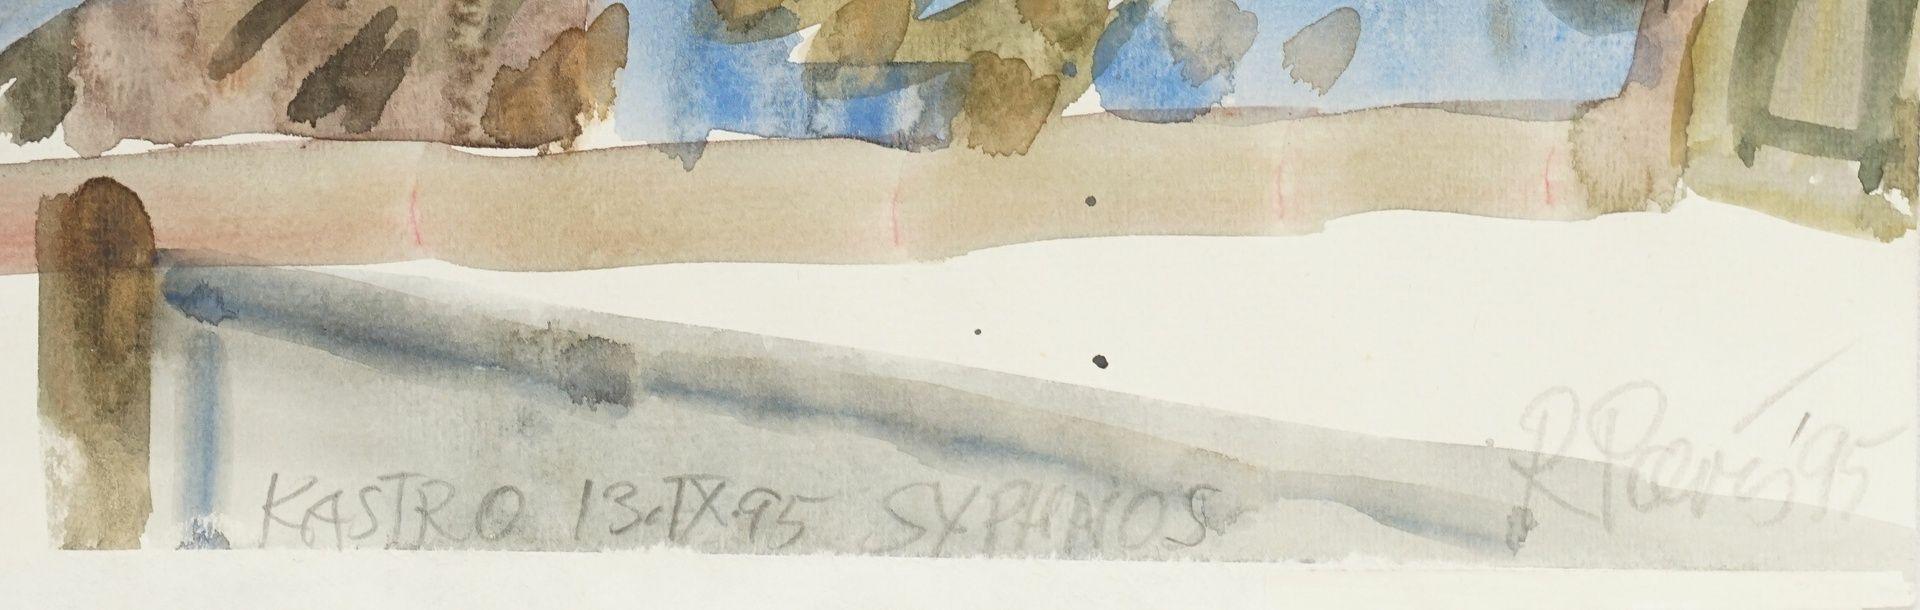 "Ronald Paris, ""Kastro Syphnos (Sifnos)"" - Bild 3 aus 3"